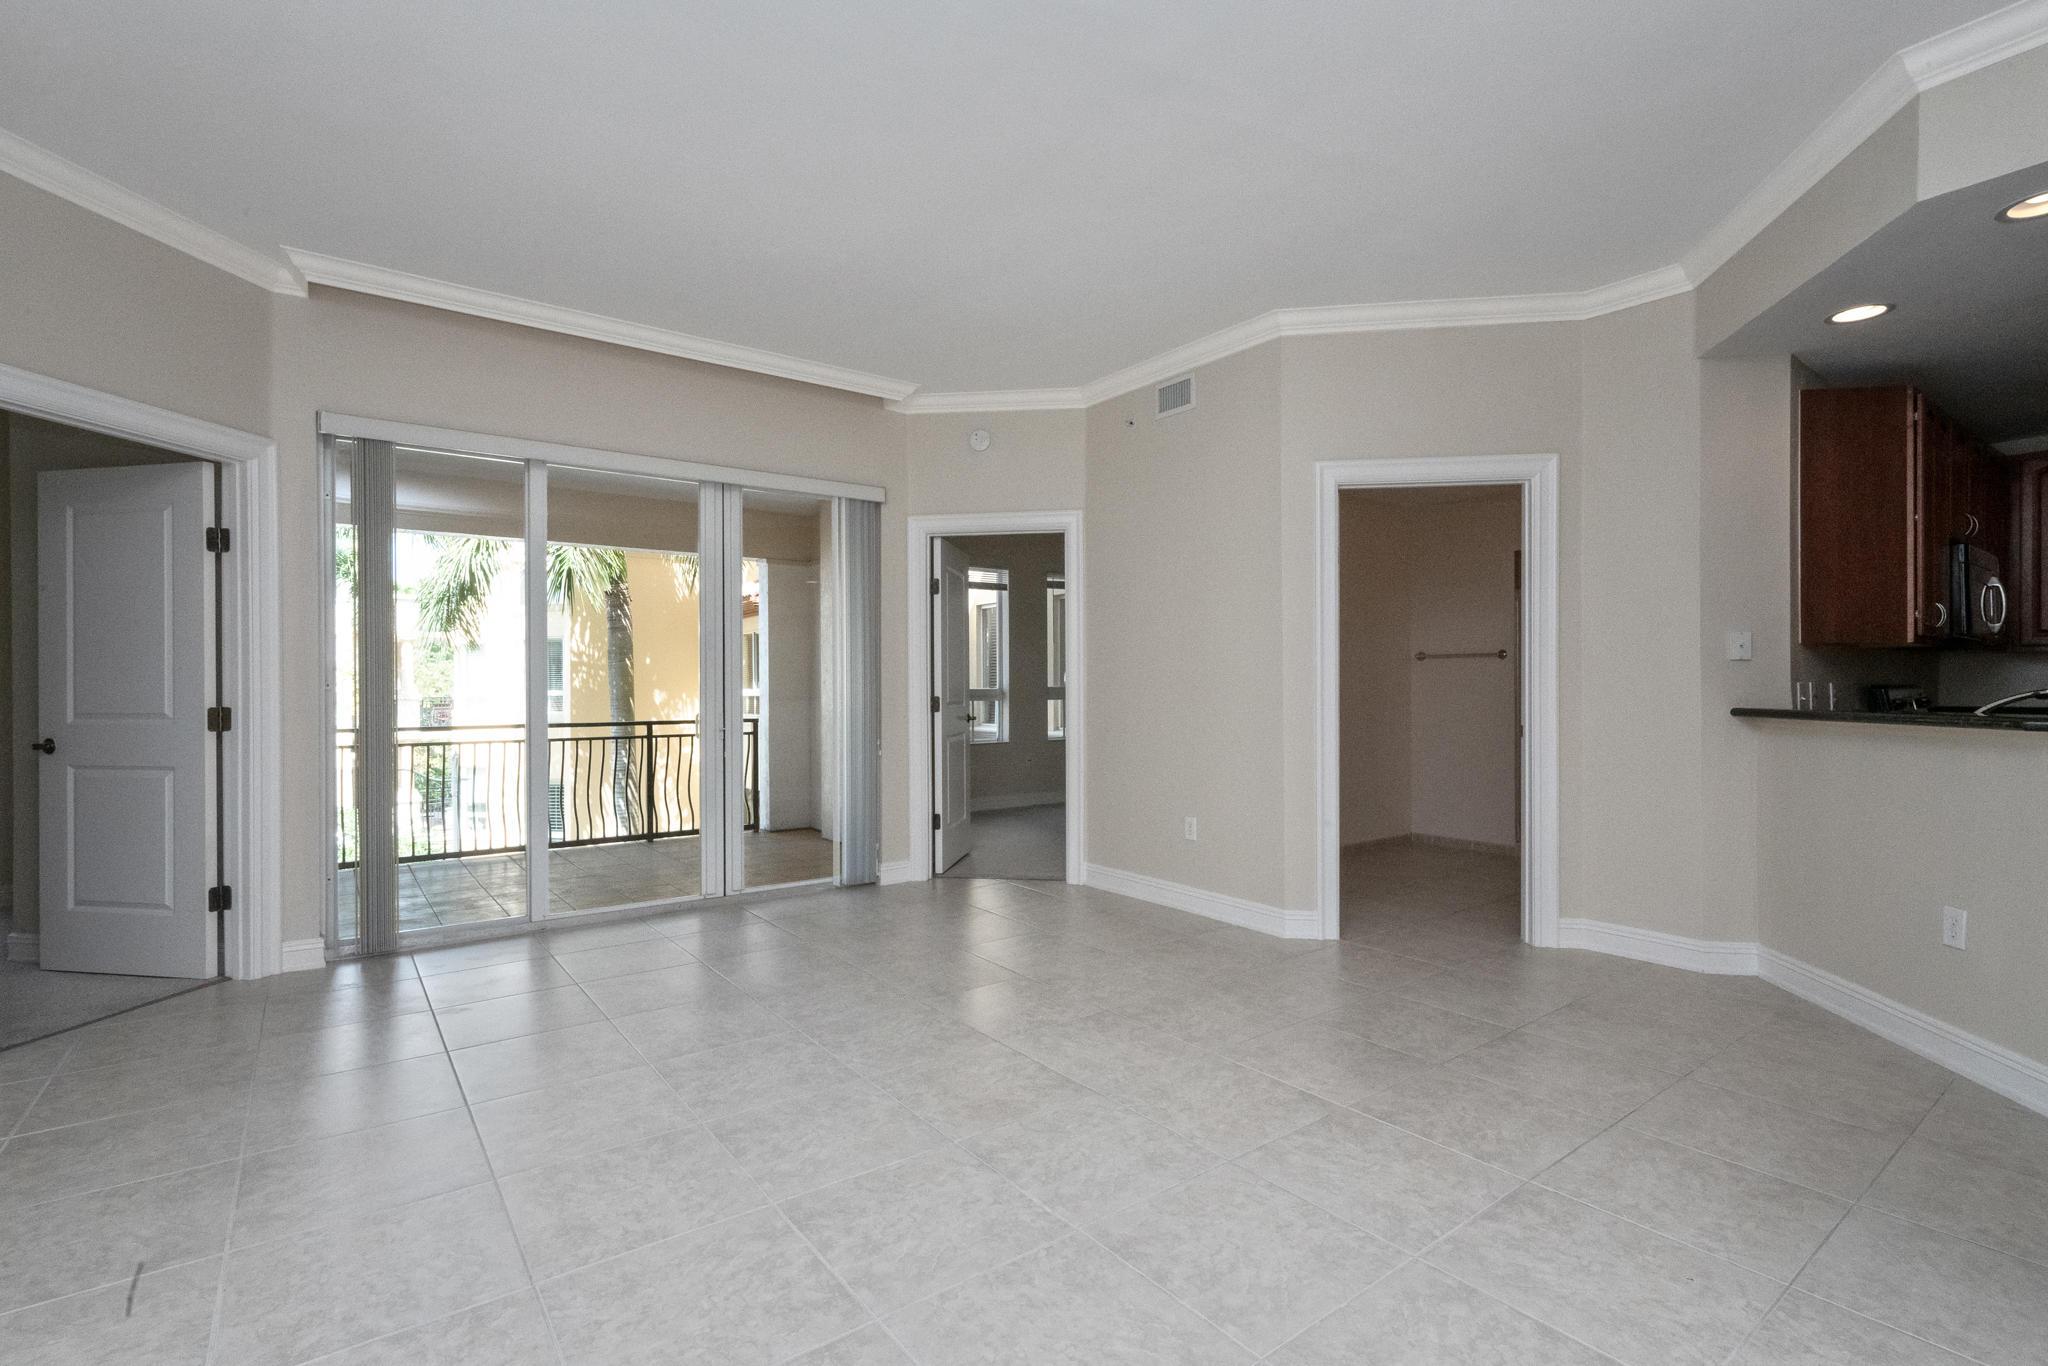 Image 18 For 16100 Emerald Estates Drive 390